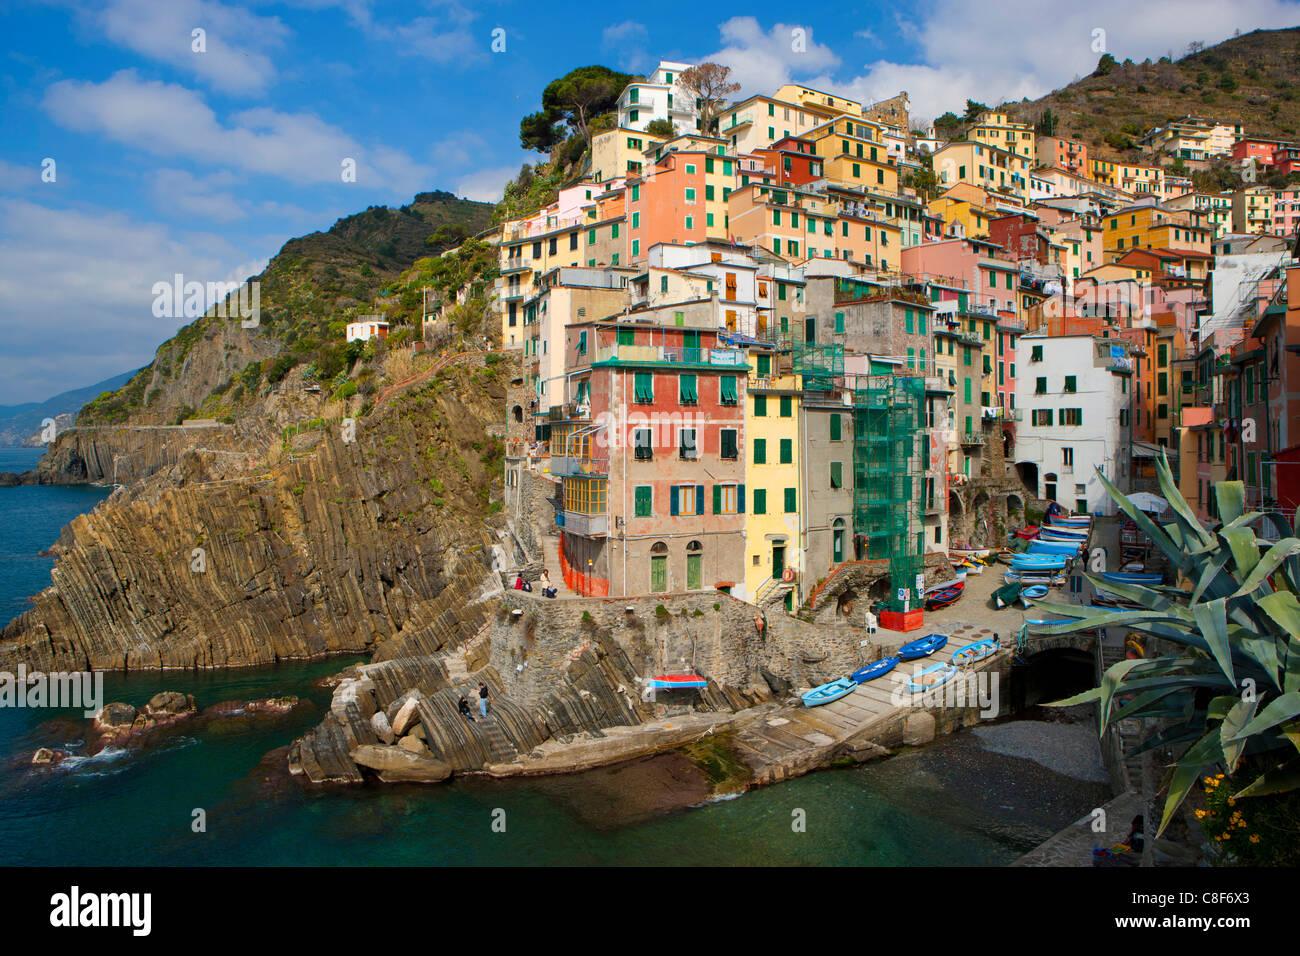 sea monterosso italy - photo #16